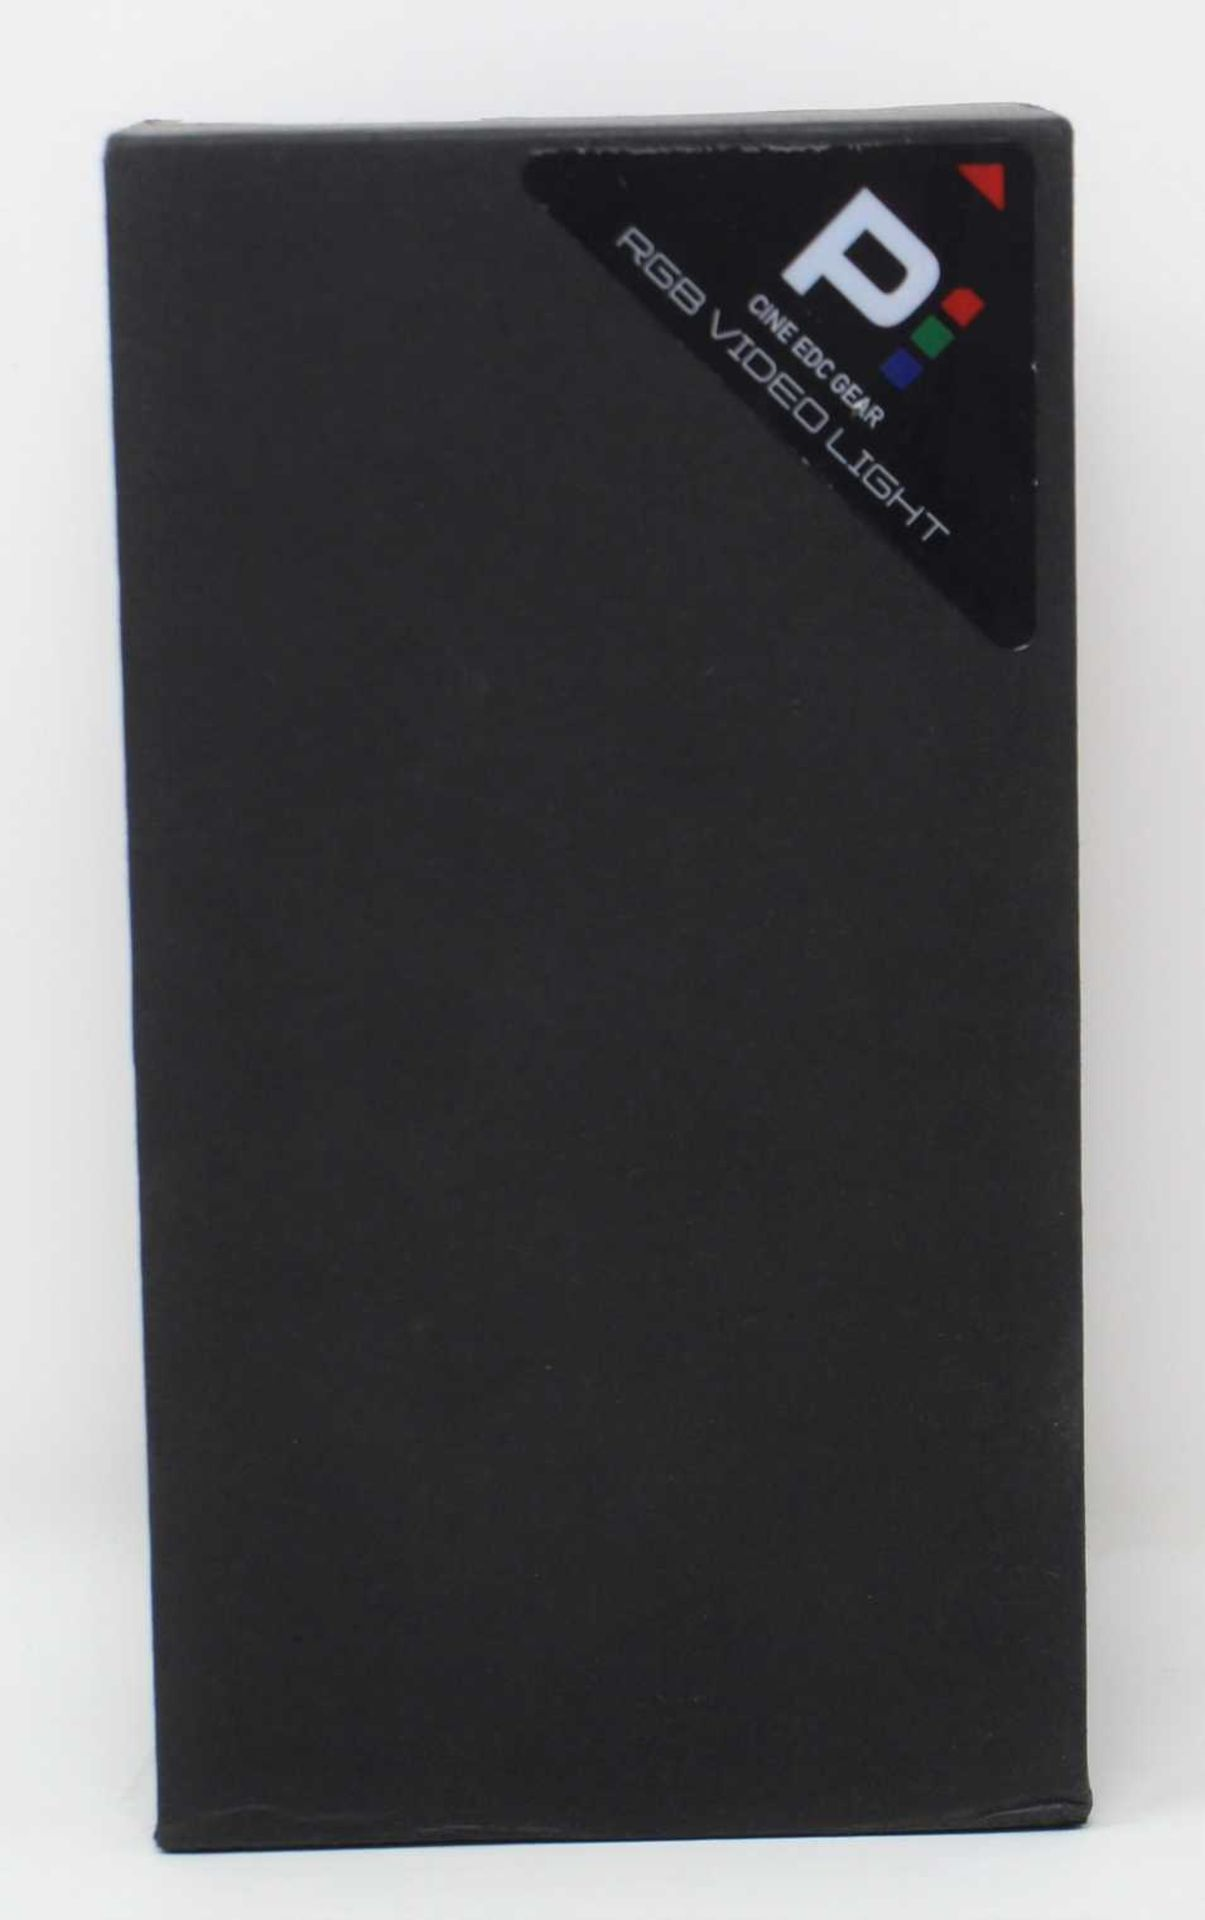 A boxed as new Boling BL-P1 RGB Led Video Light (Box sealed).